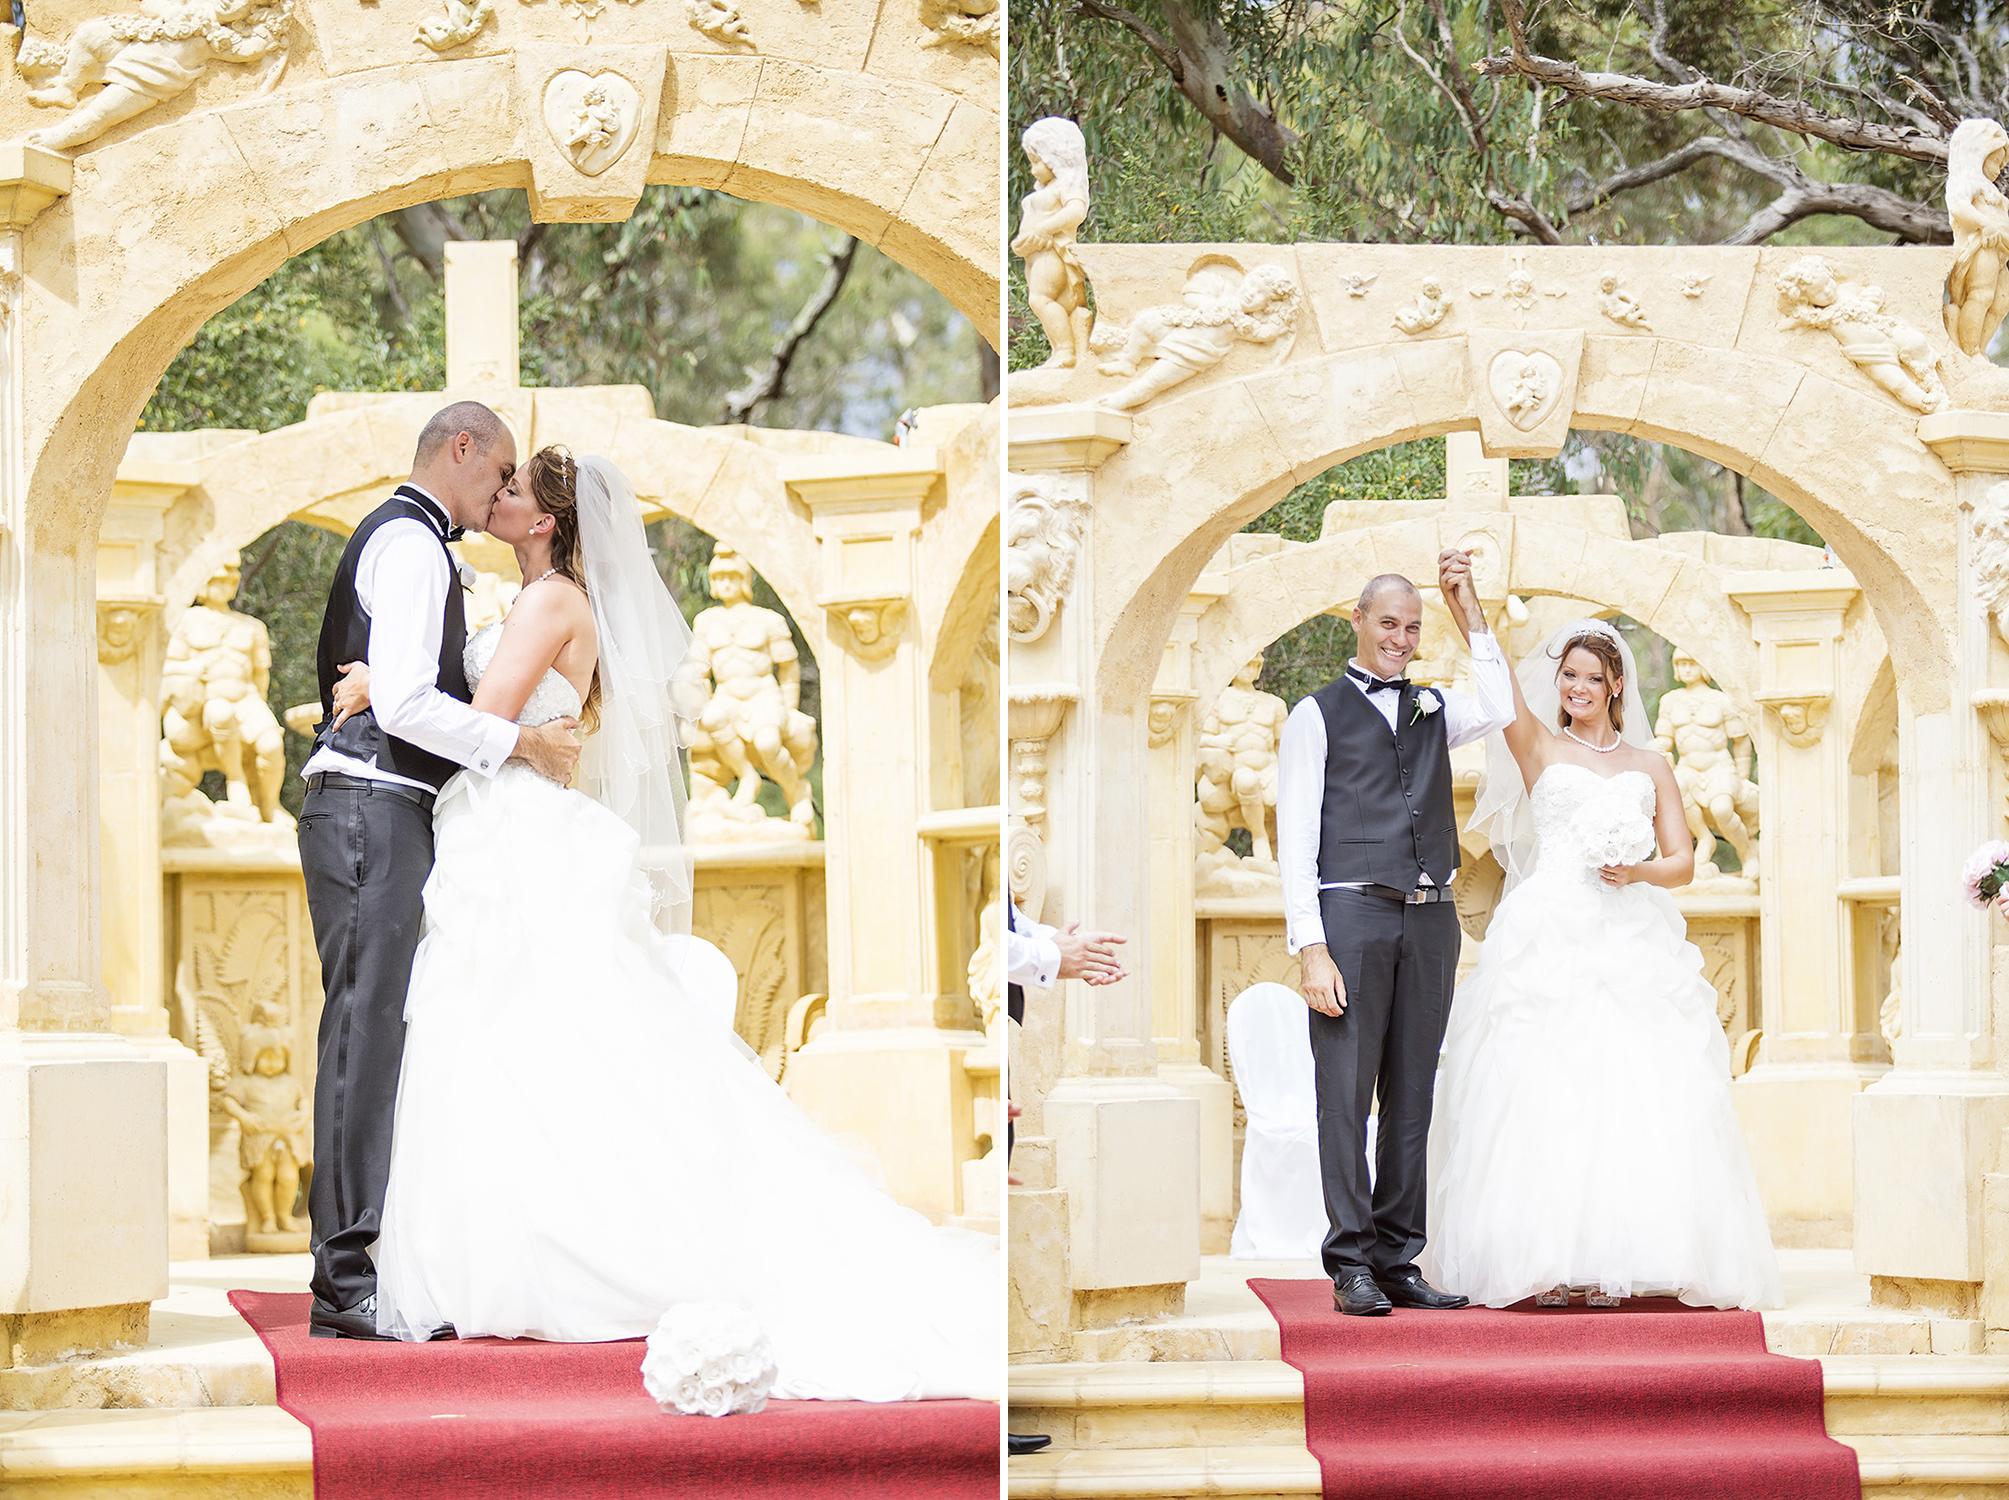 One Tree Hill Wedding Photography Art Through Da Vinces Eyes 10.jpg